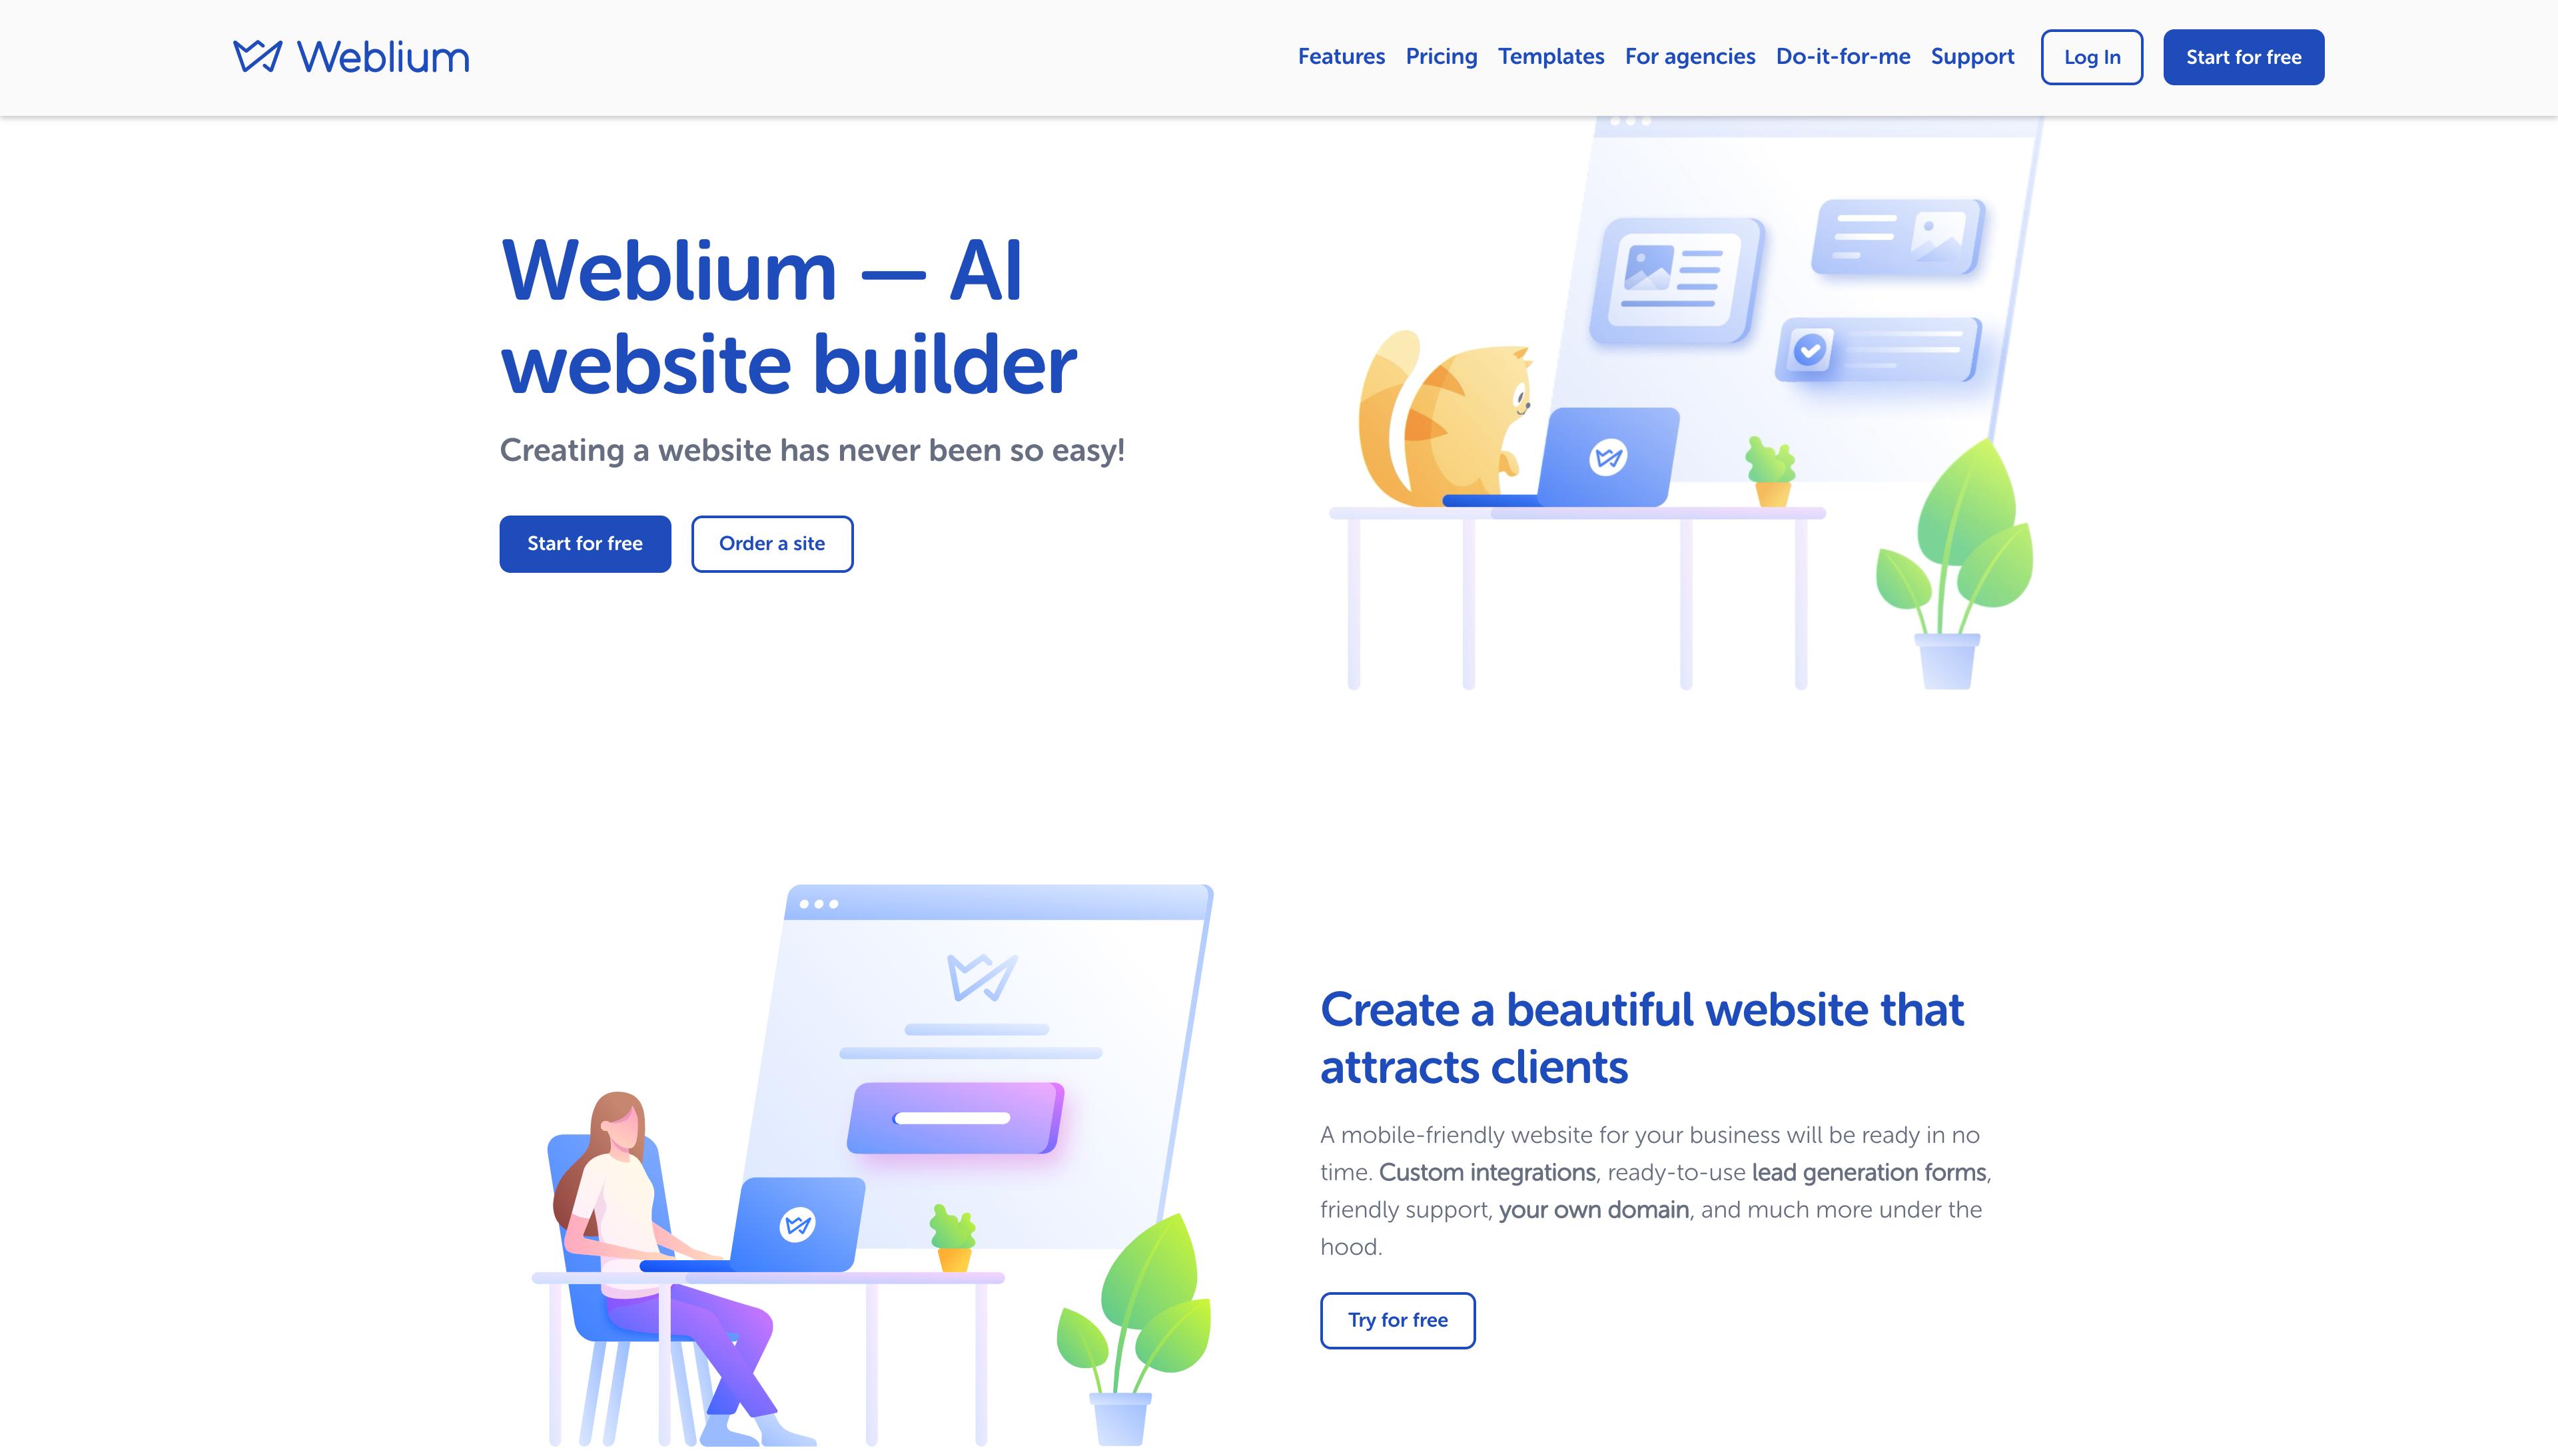 Weblium Website Builder